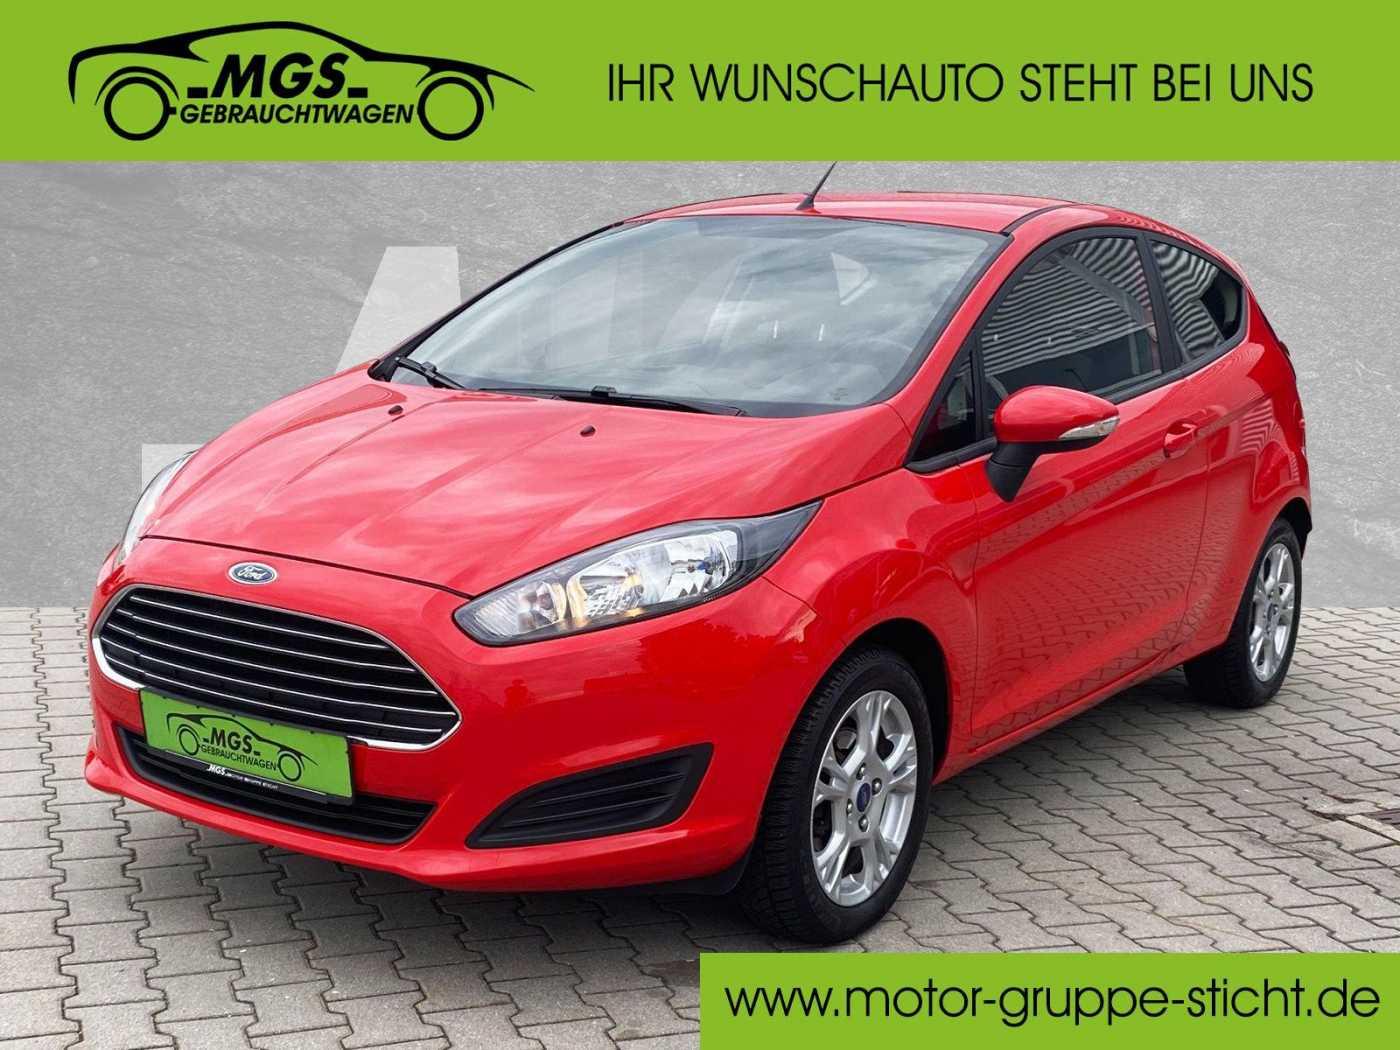 Ford Fiesta 1.0 EcoBoost Sync-Edition 3trg, Jahr 2014, Benzin